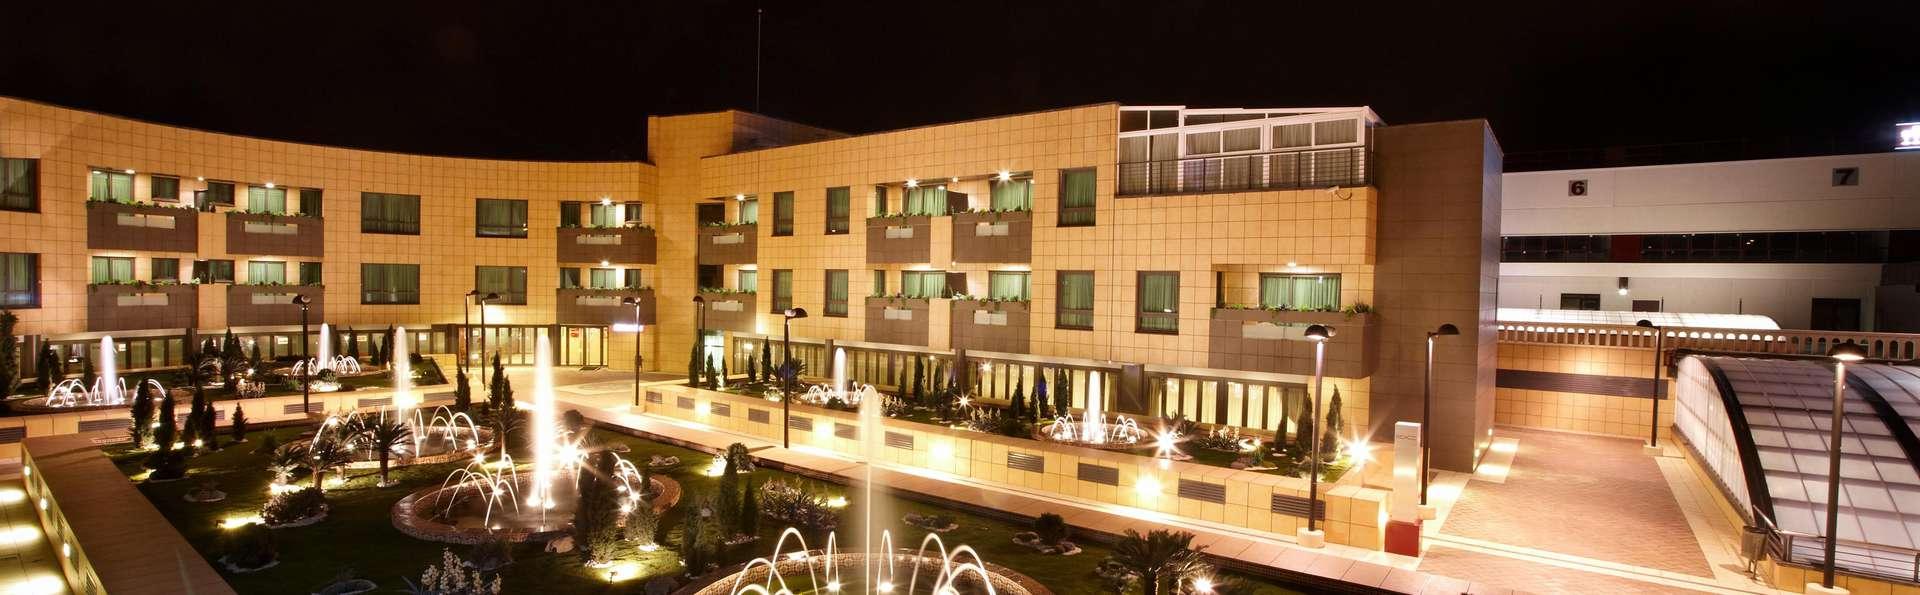 Hotel Foxa Valladolid - main_photo.JPG